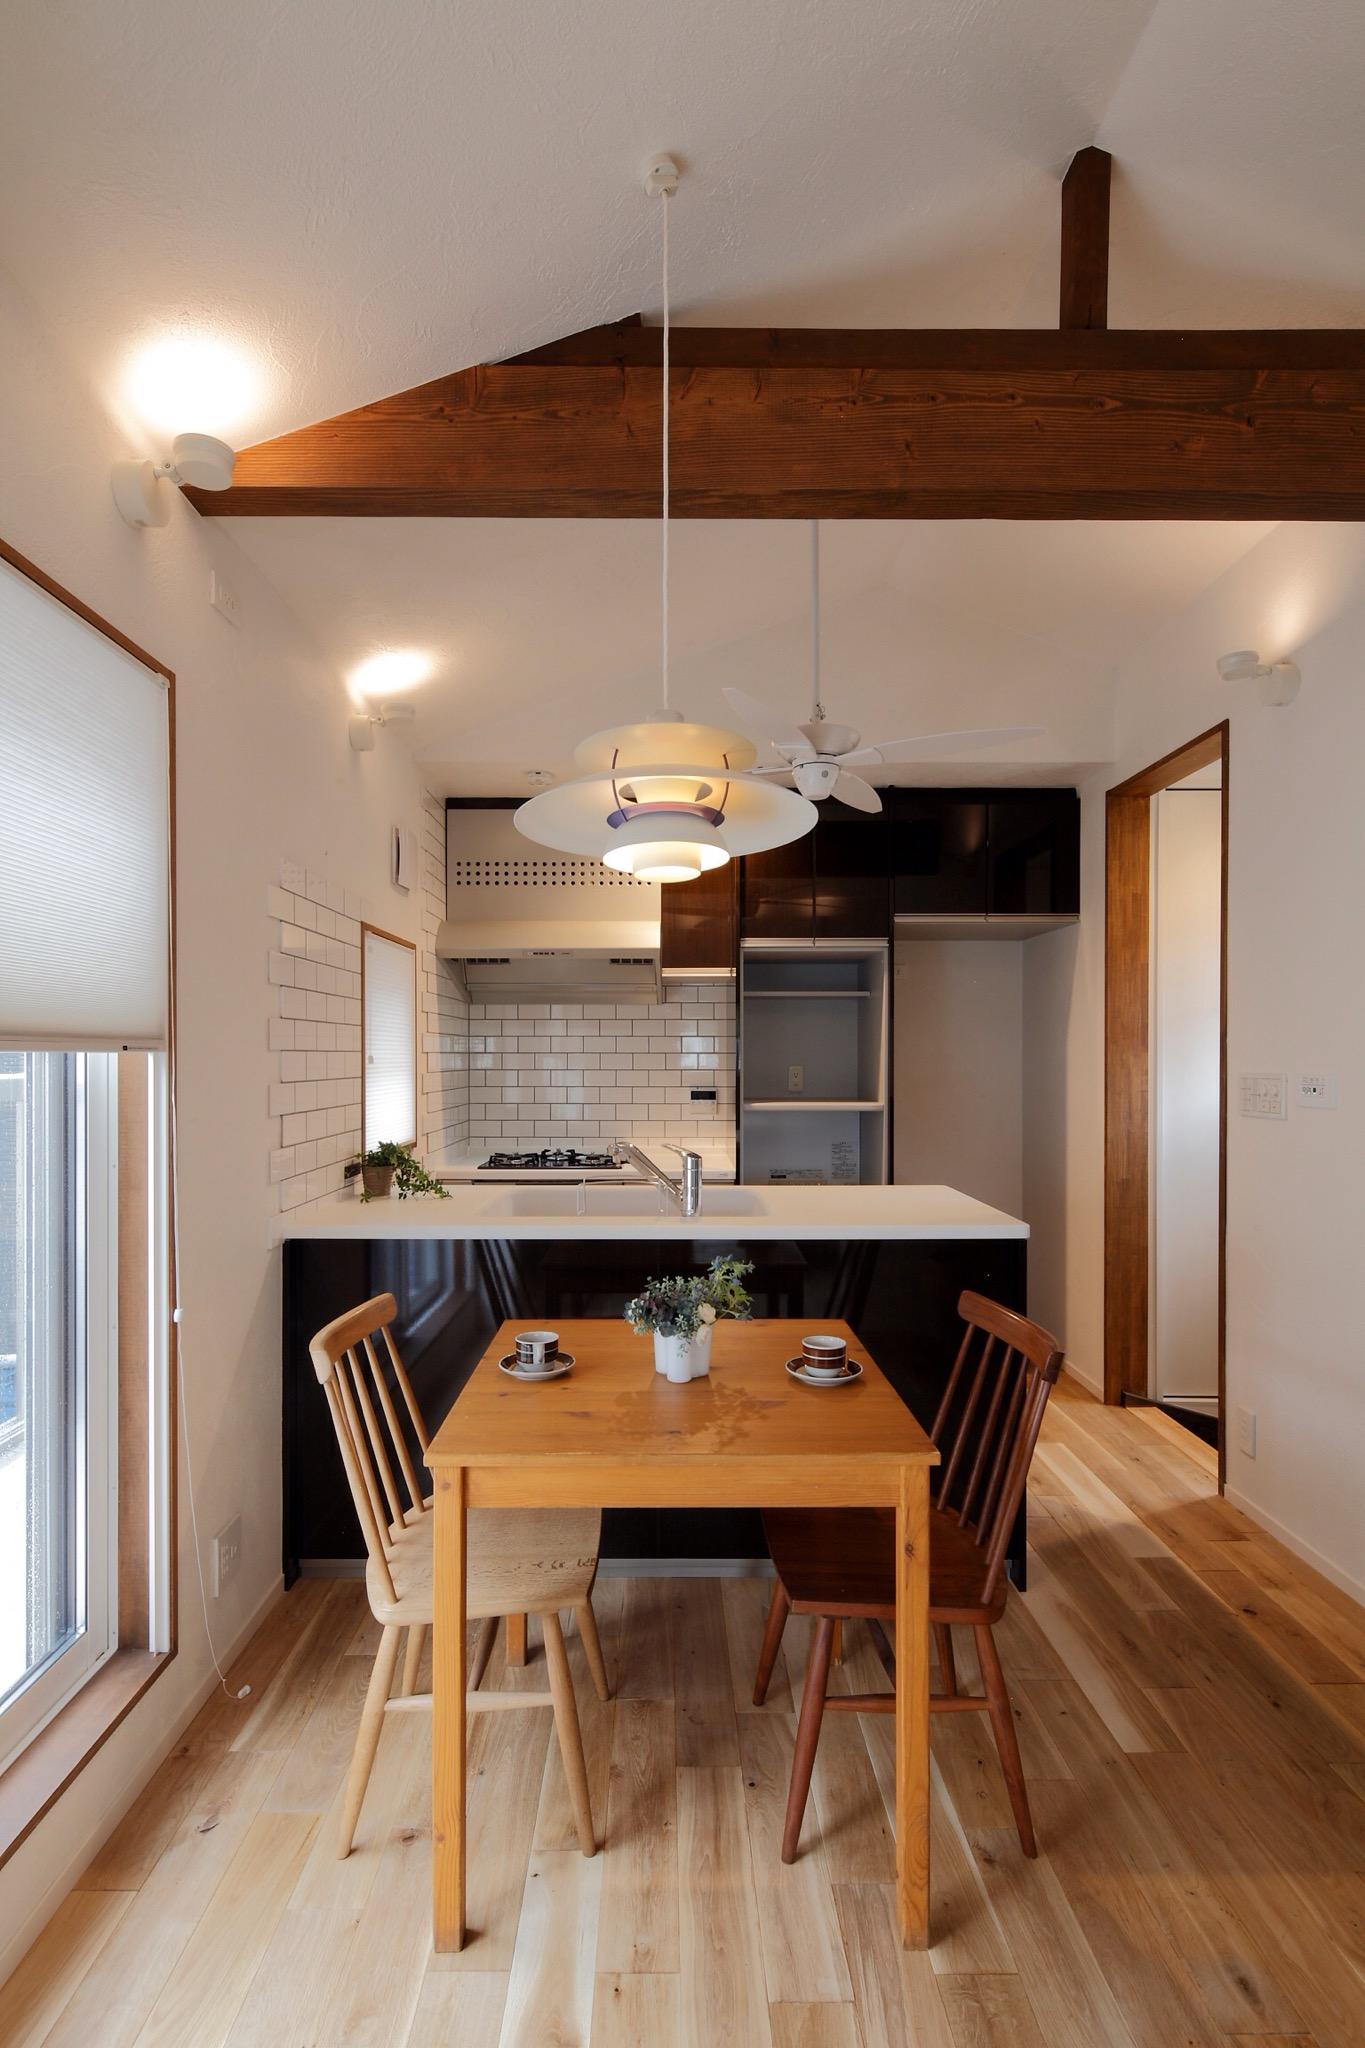 louis poulsen ph5 okuta. Black Bedroom Furniture Sets. Home Design Ideas